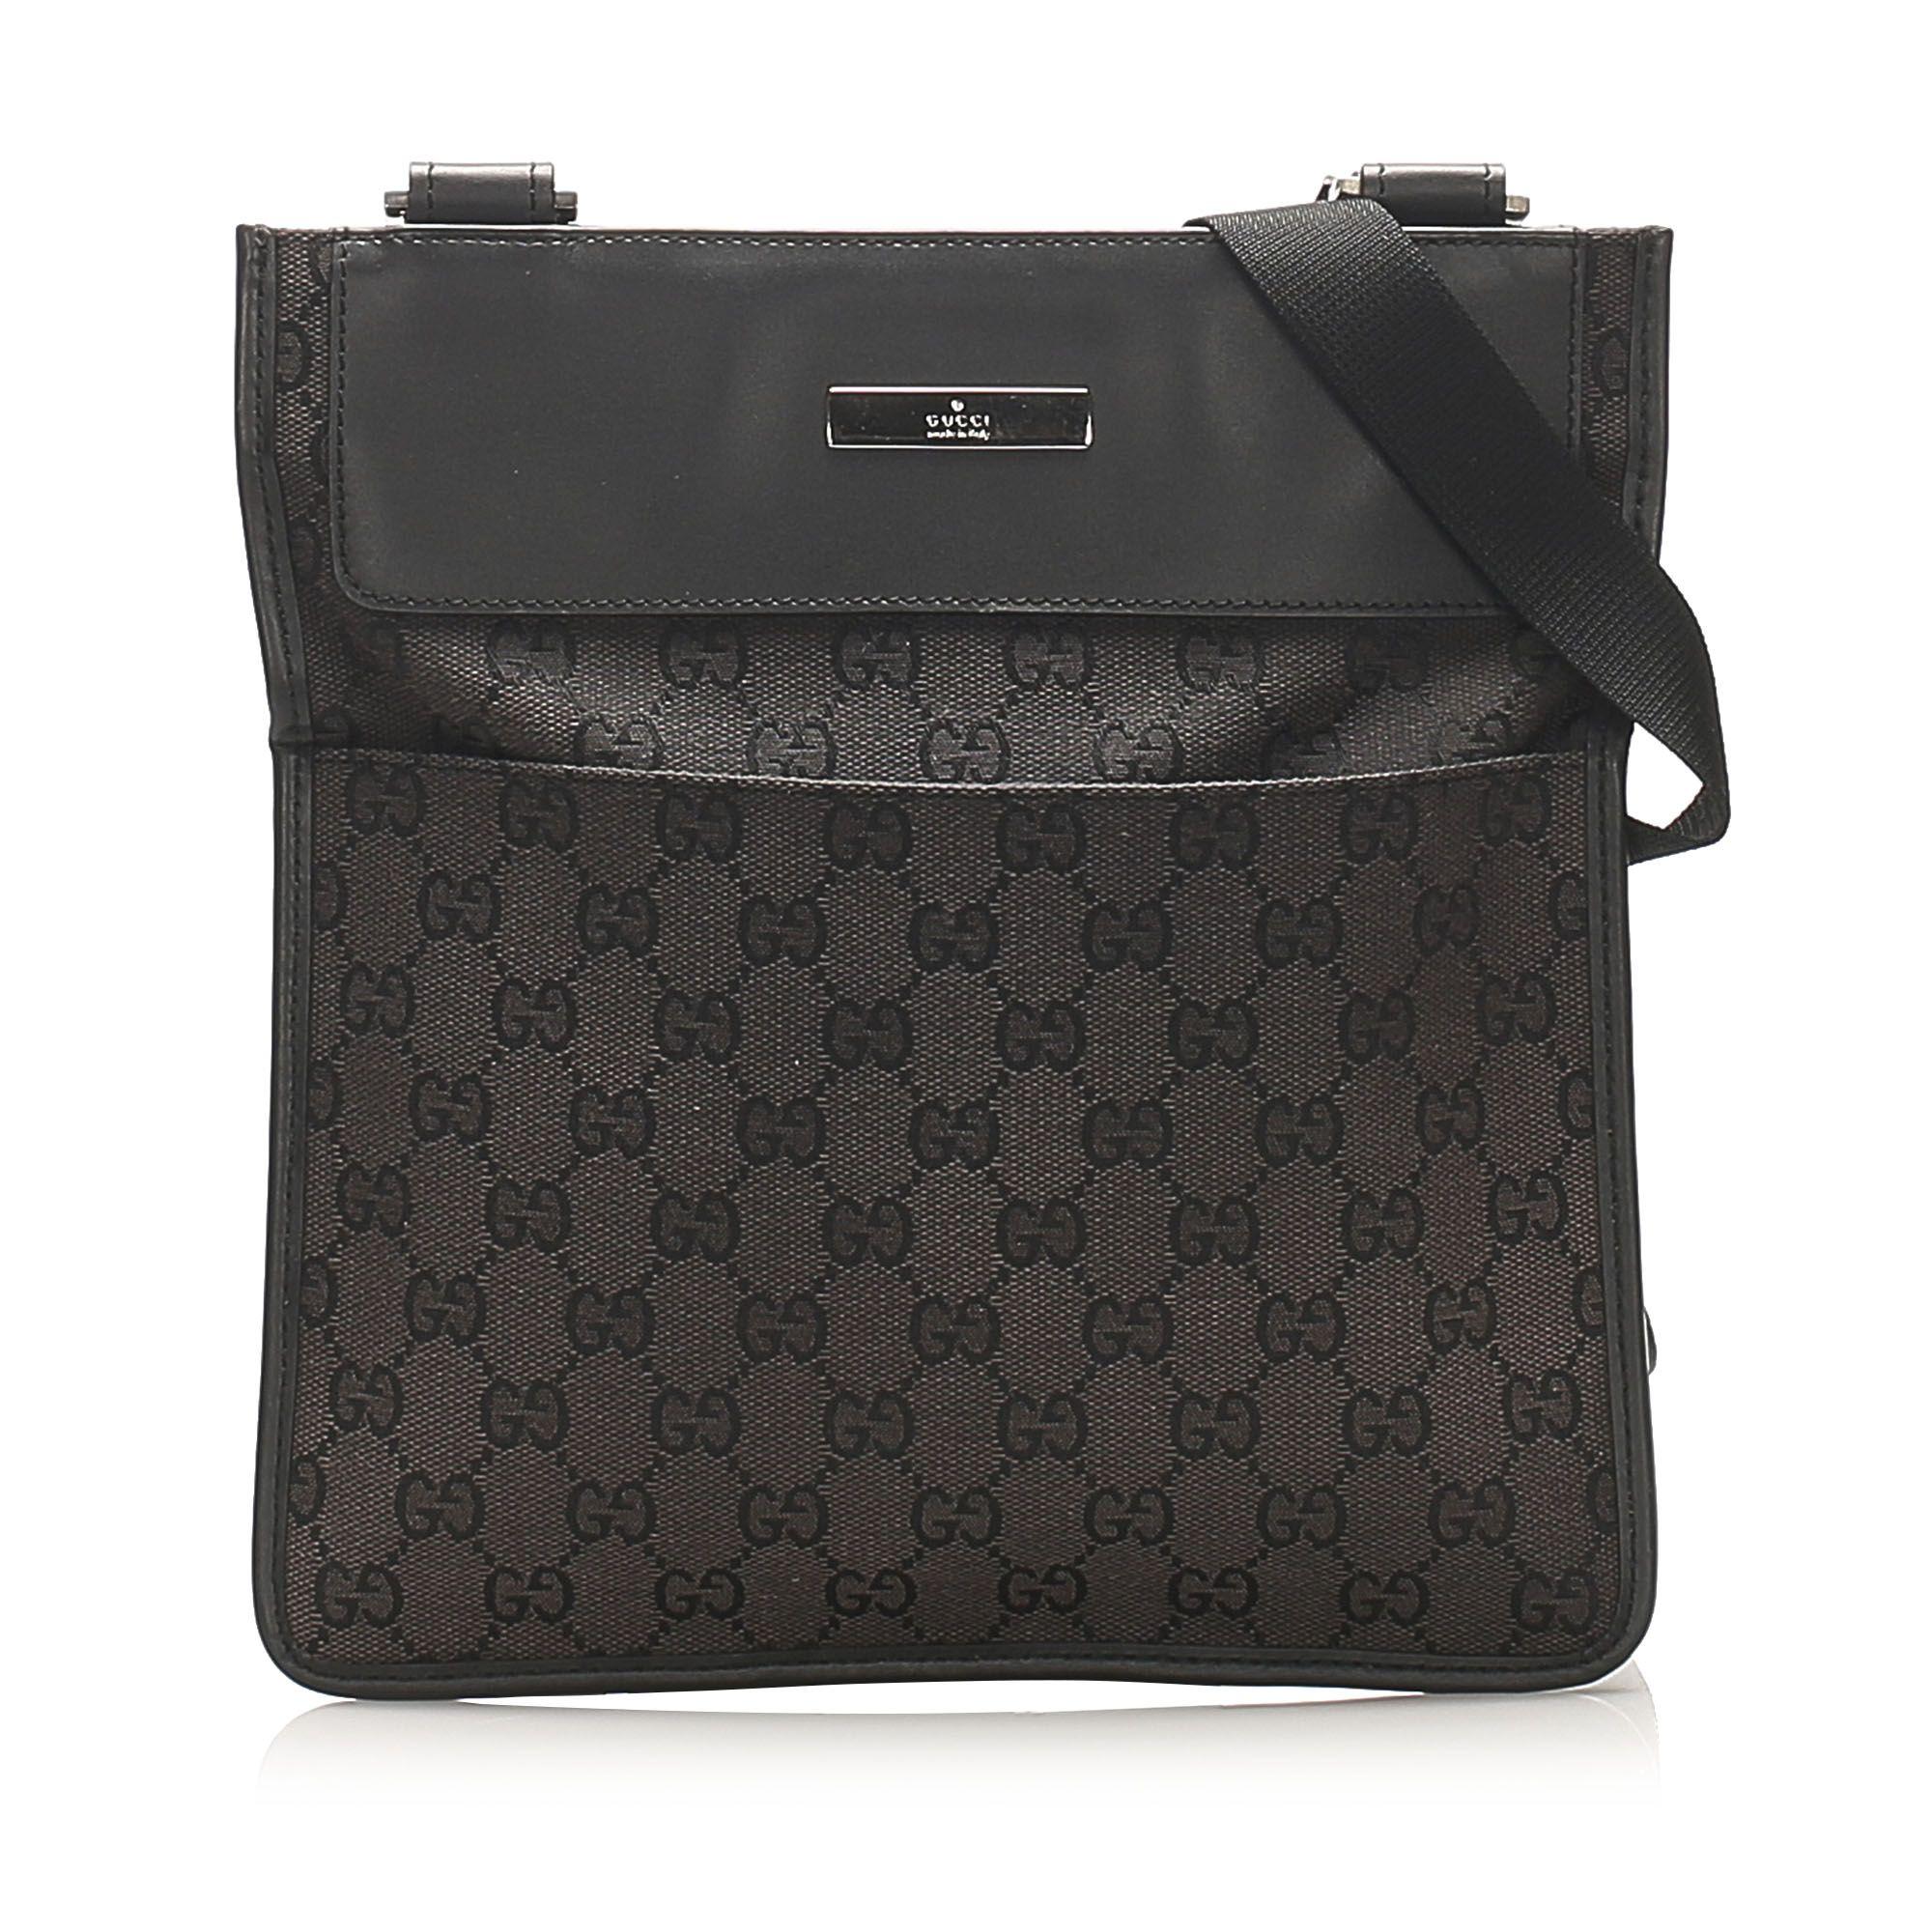 Vintage Gucci GG Canvas Crossbody Bag Black